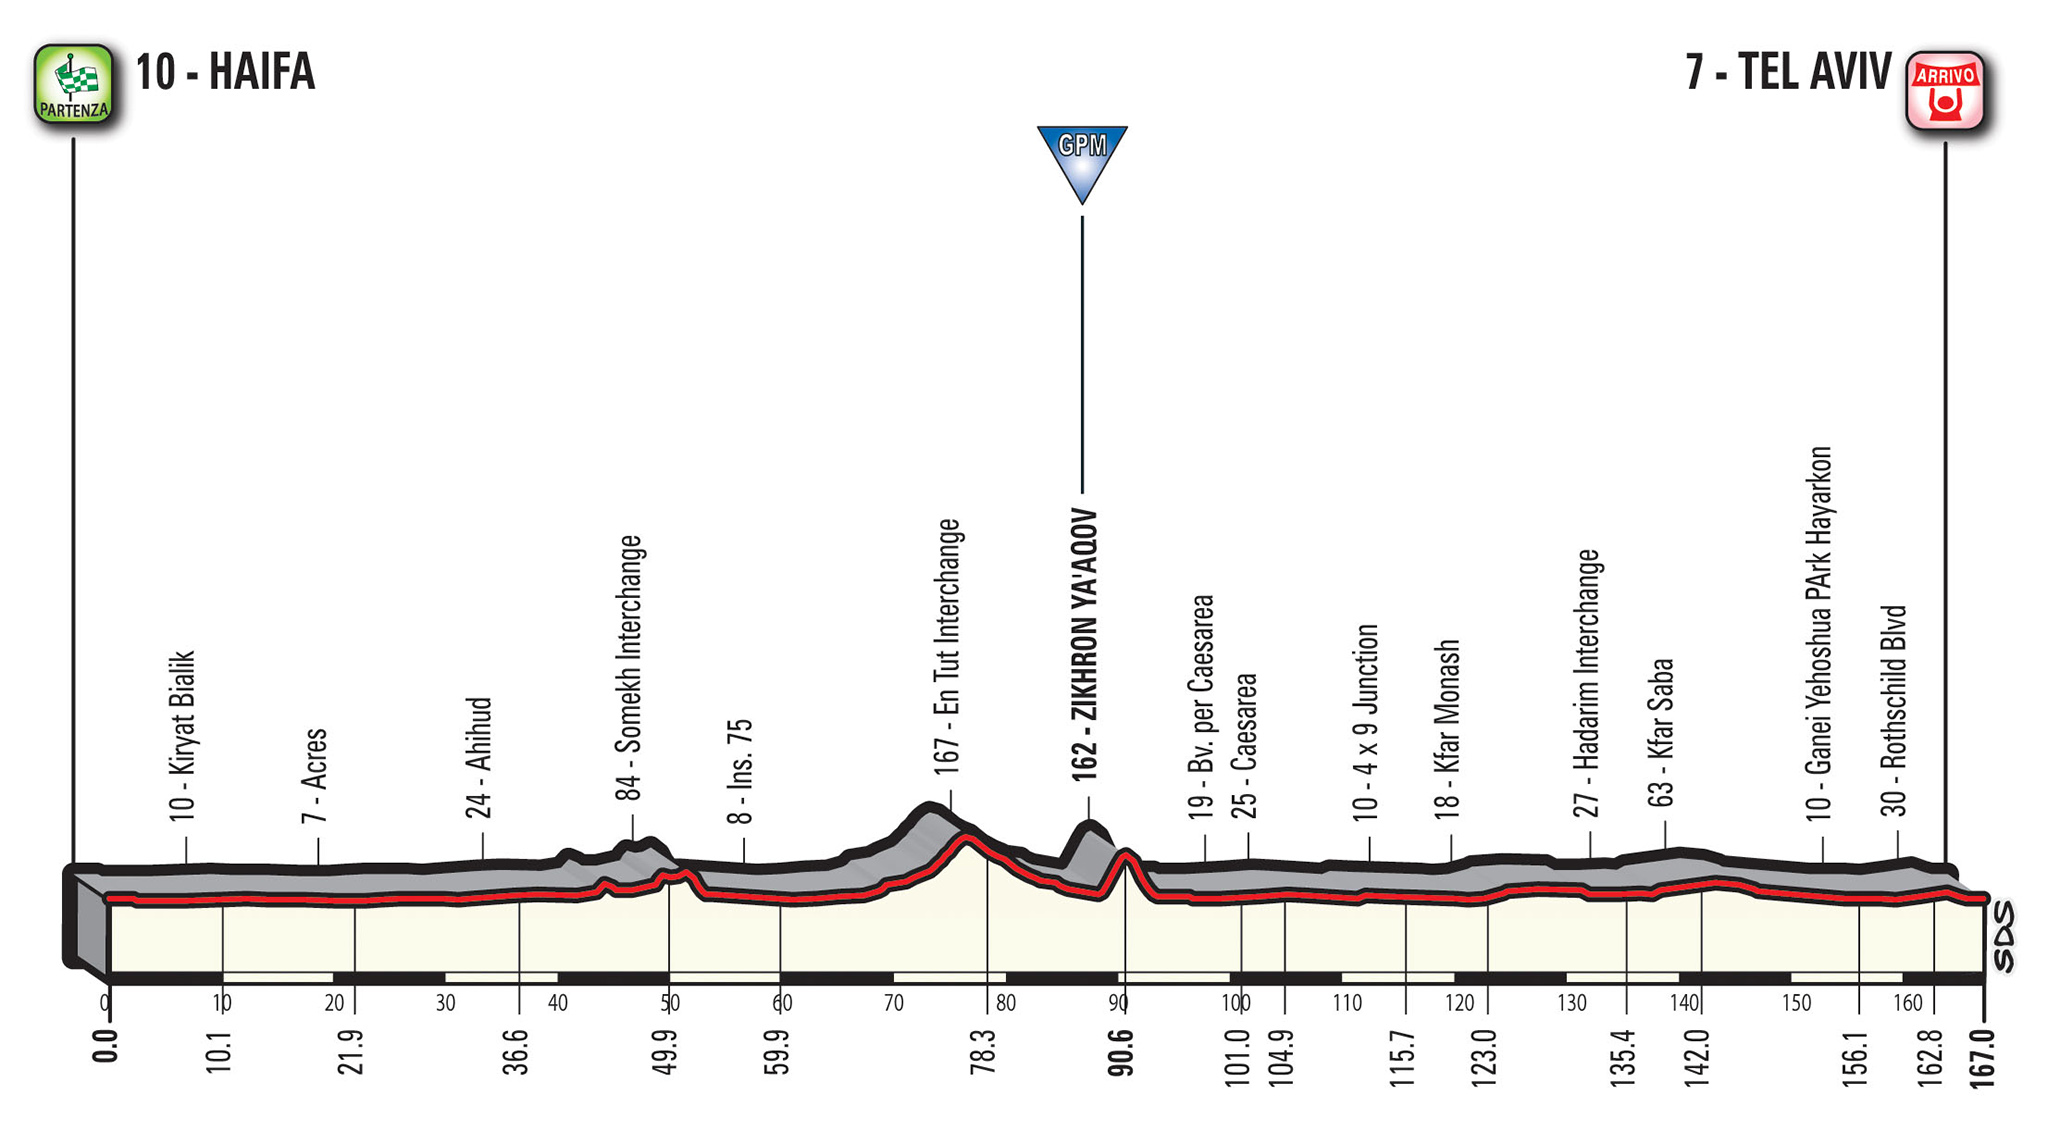 Via da Gerusalemme al Giro d'Italia. L'Irpinia aspetta la carovana rosa